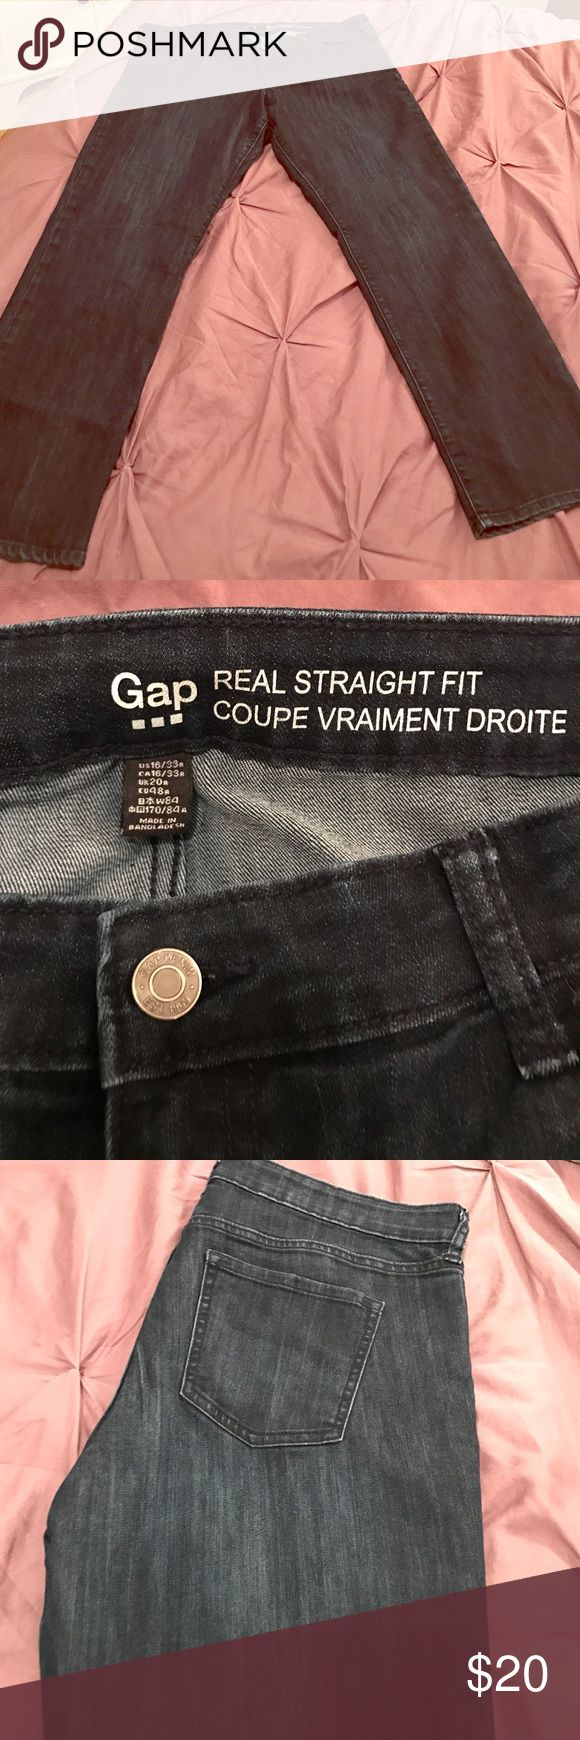 "Gap Jeans ""Real Straight Fit"" Dark Denim Gap Jeans ""Real Straight Fit"" Dark Denim. Size 16 Average. Straight leg, hardly worn! GAP Jeans Straight Leg"